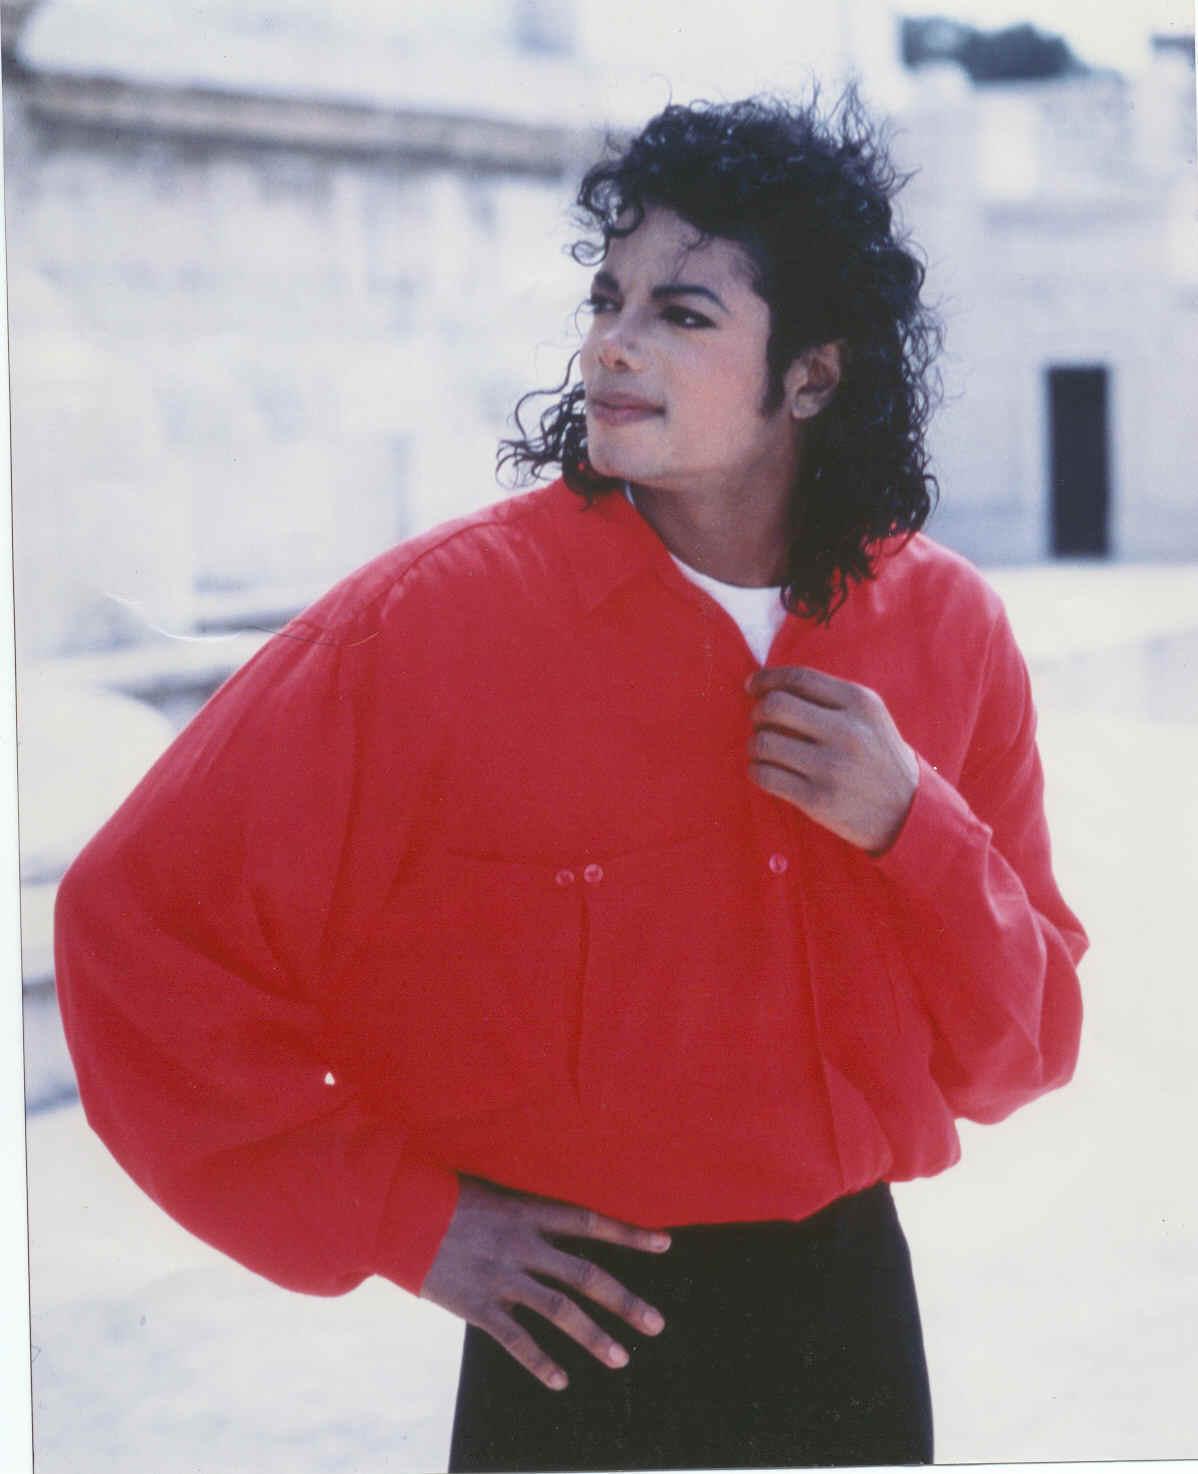 Michael-in-Rome-michael-jackson-8245464-1198-1474.jpg